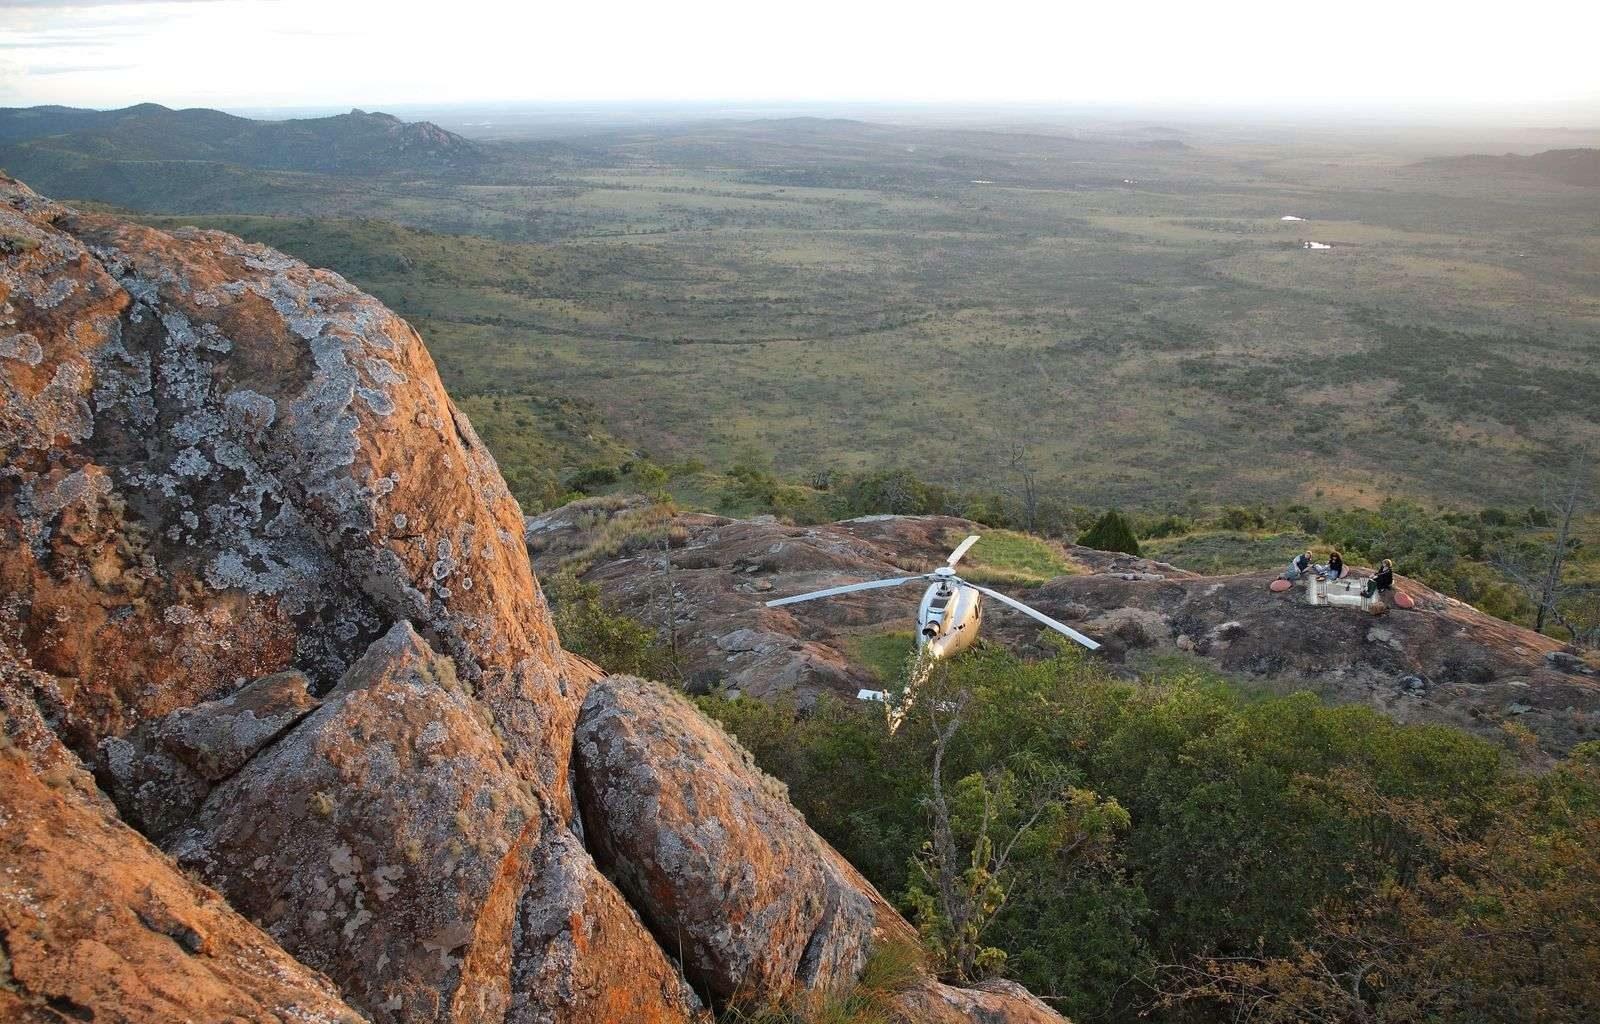 Enasoit Kenya Aerial Shot